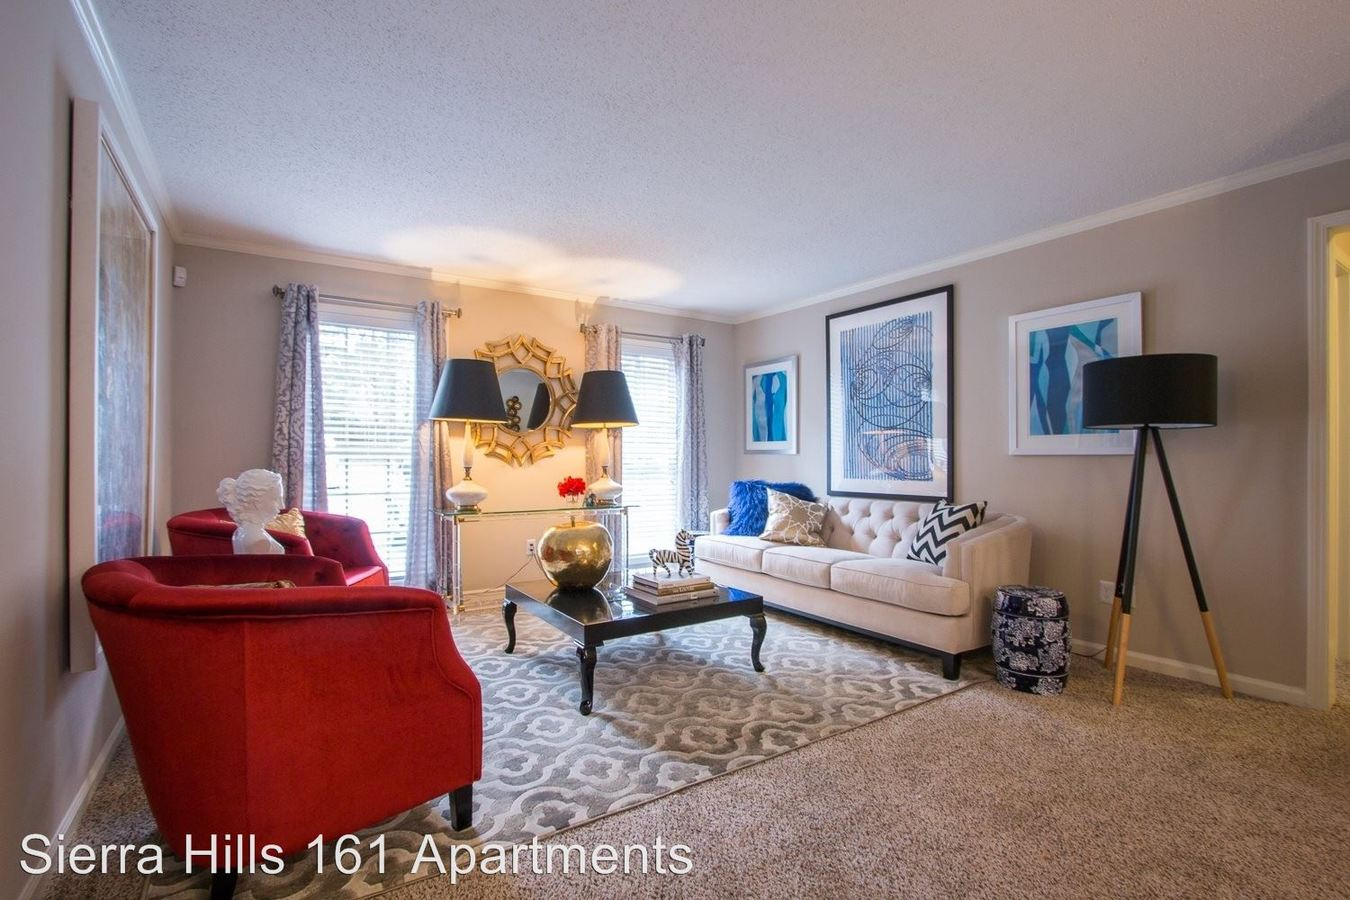 3 Bedrooms 2 Bathrooms Apartment for rent at Sierra Hills Apartments in Atlanta, GA